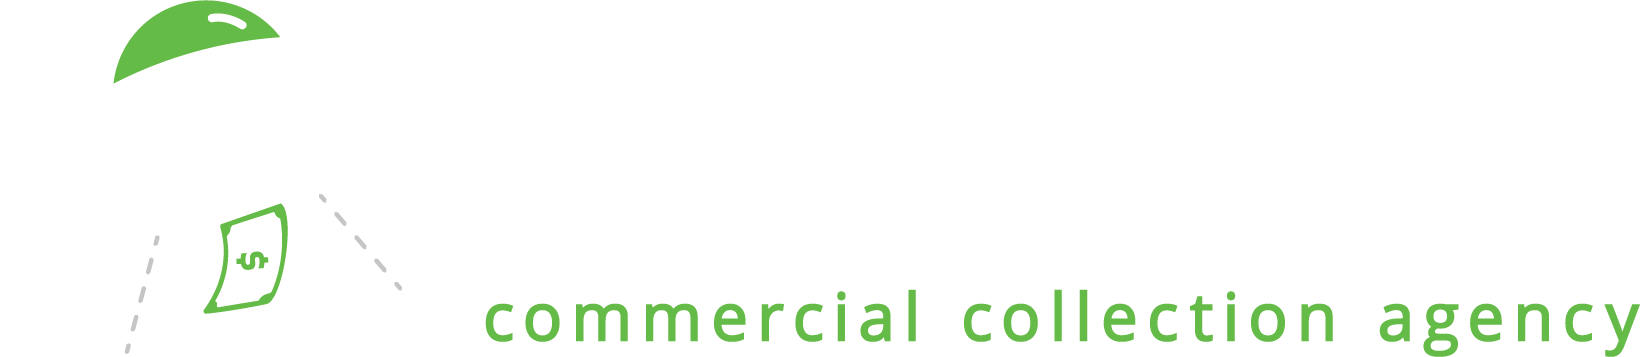 Enterprise Recovery